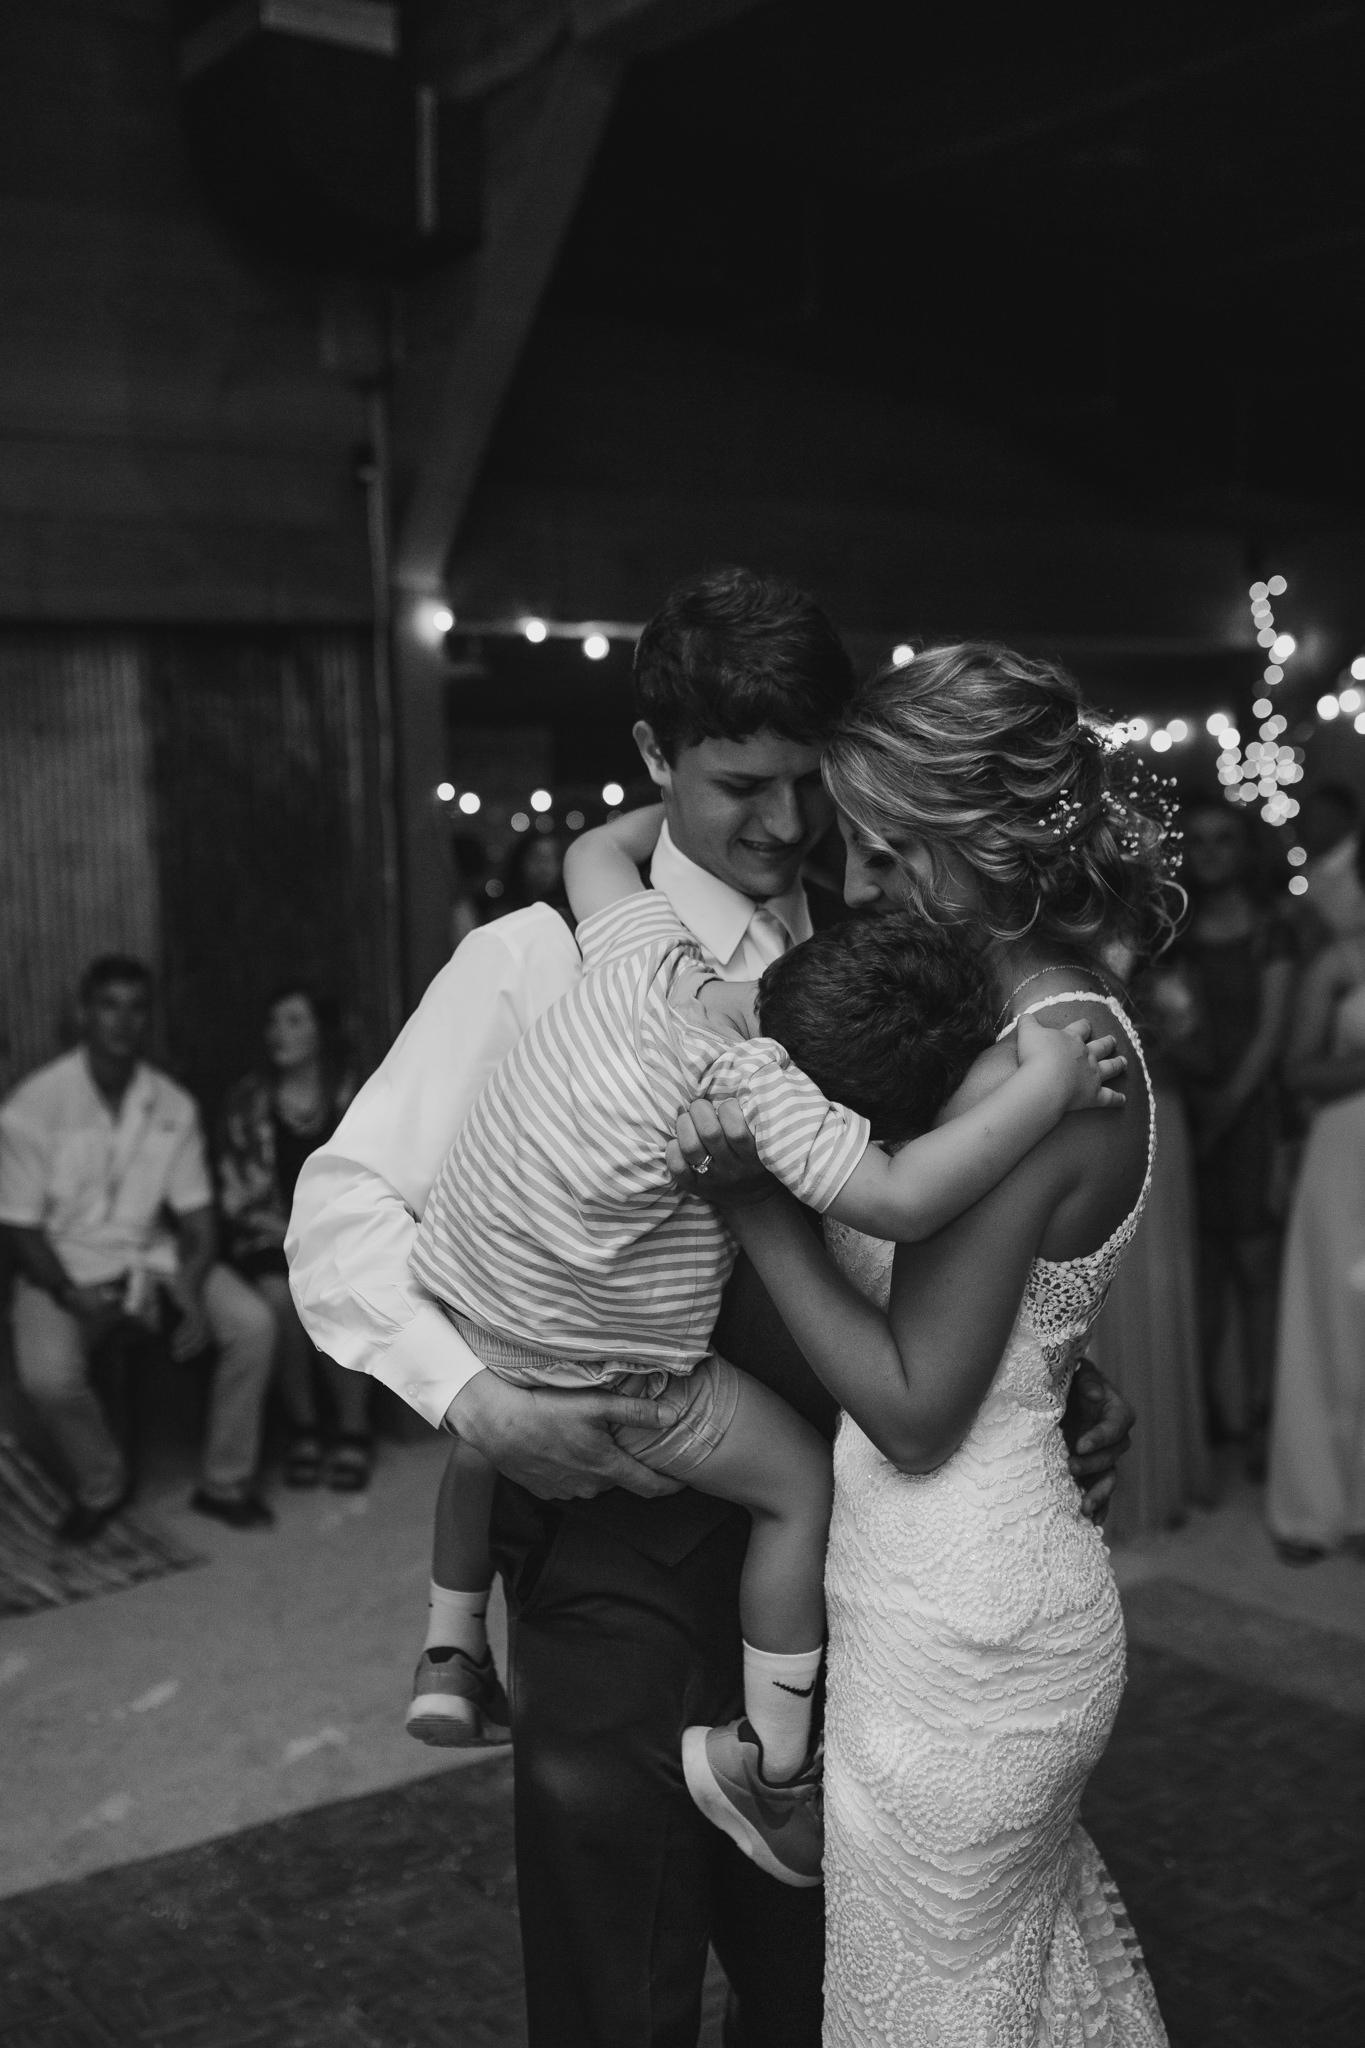 cassie-cook-photography-memphis-wedding-photographer-the-chapel-at-plein-air-sneed-wedding-57.jpg